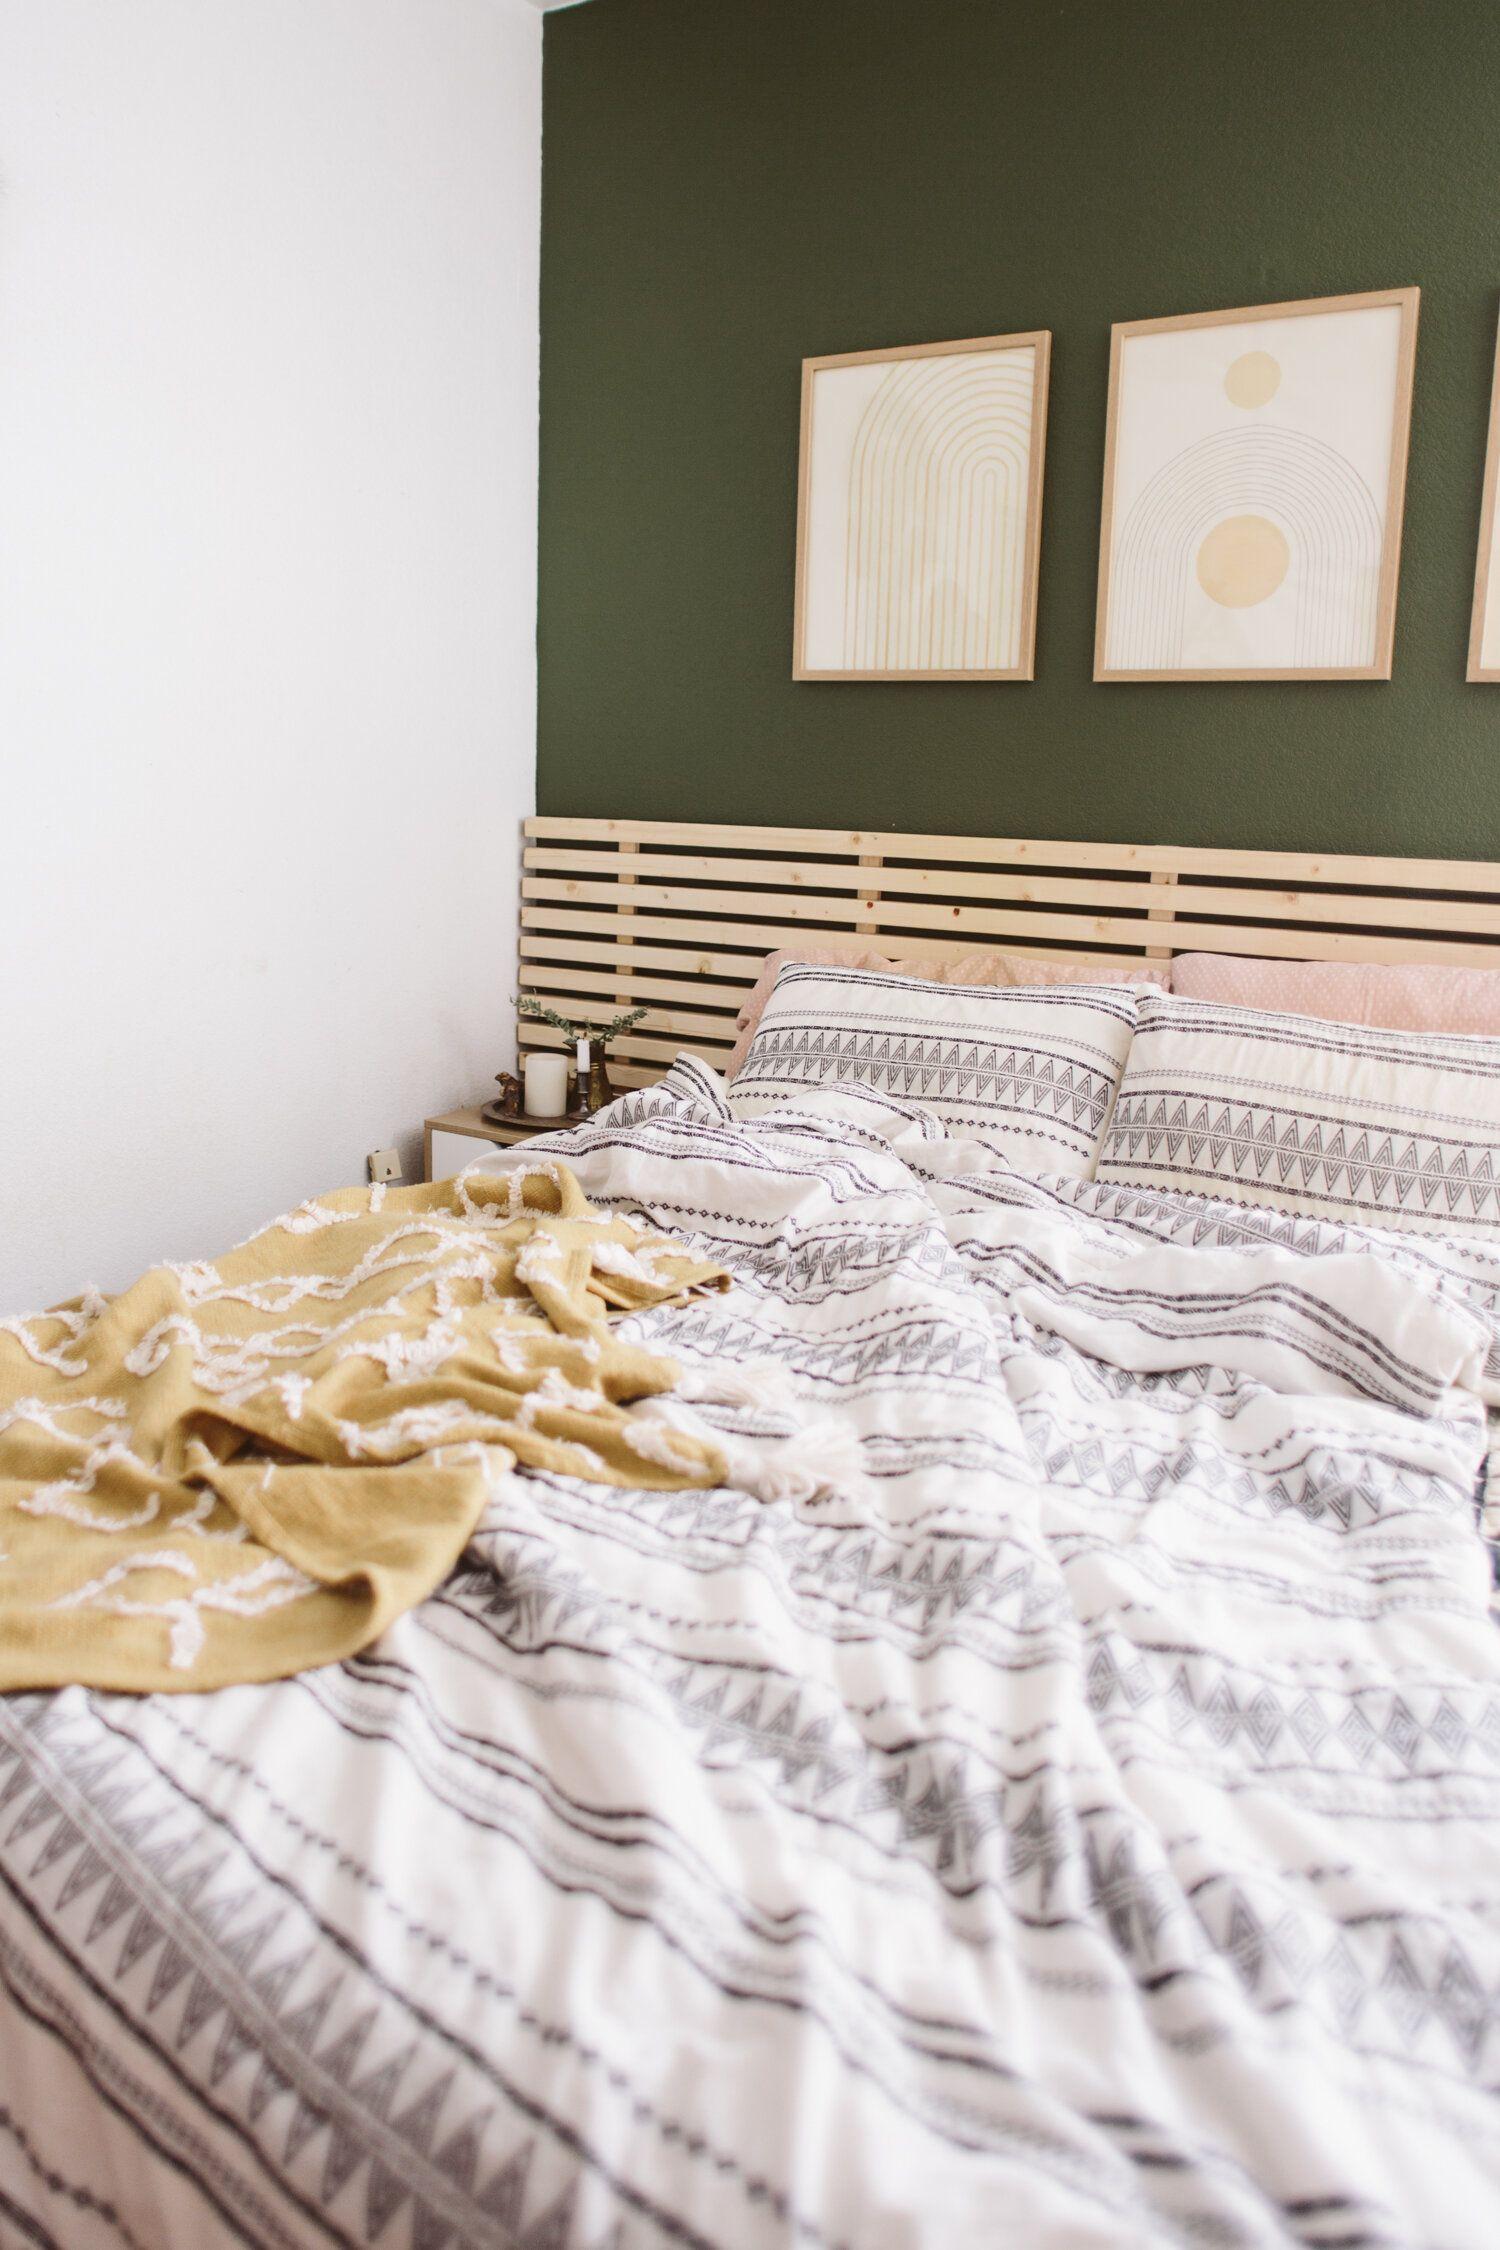 Pin on Cozy dorm room